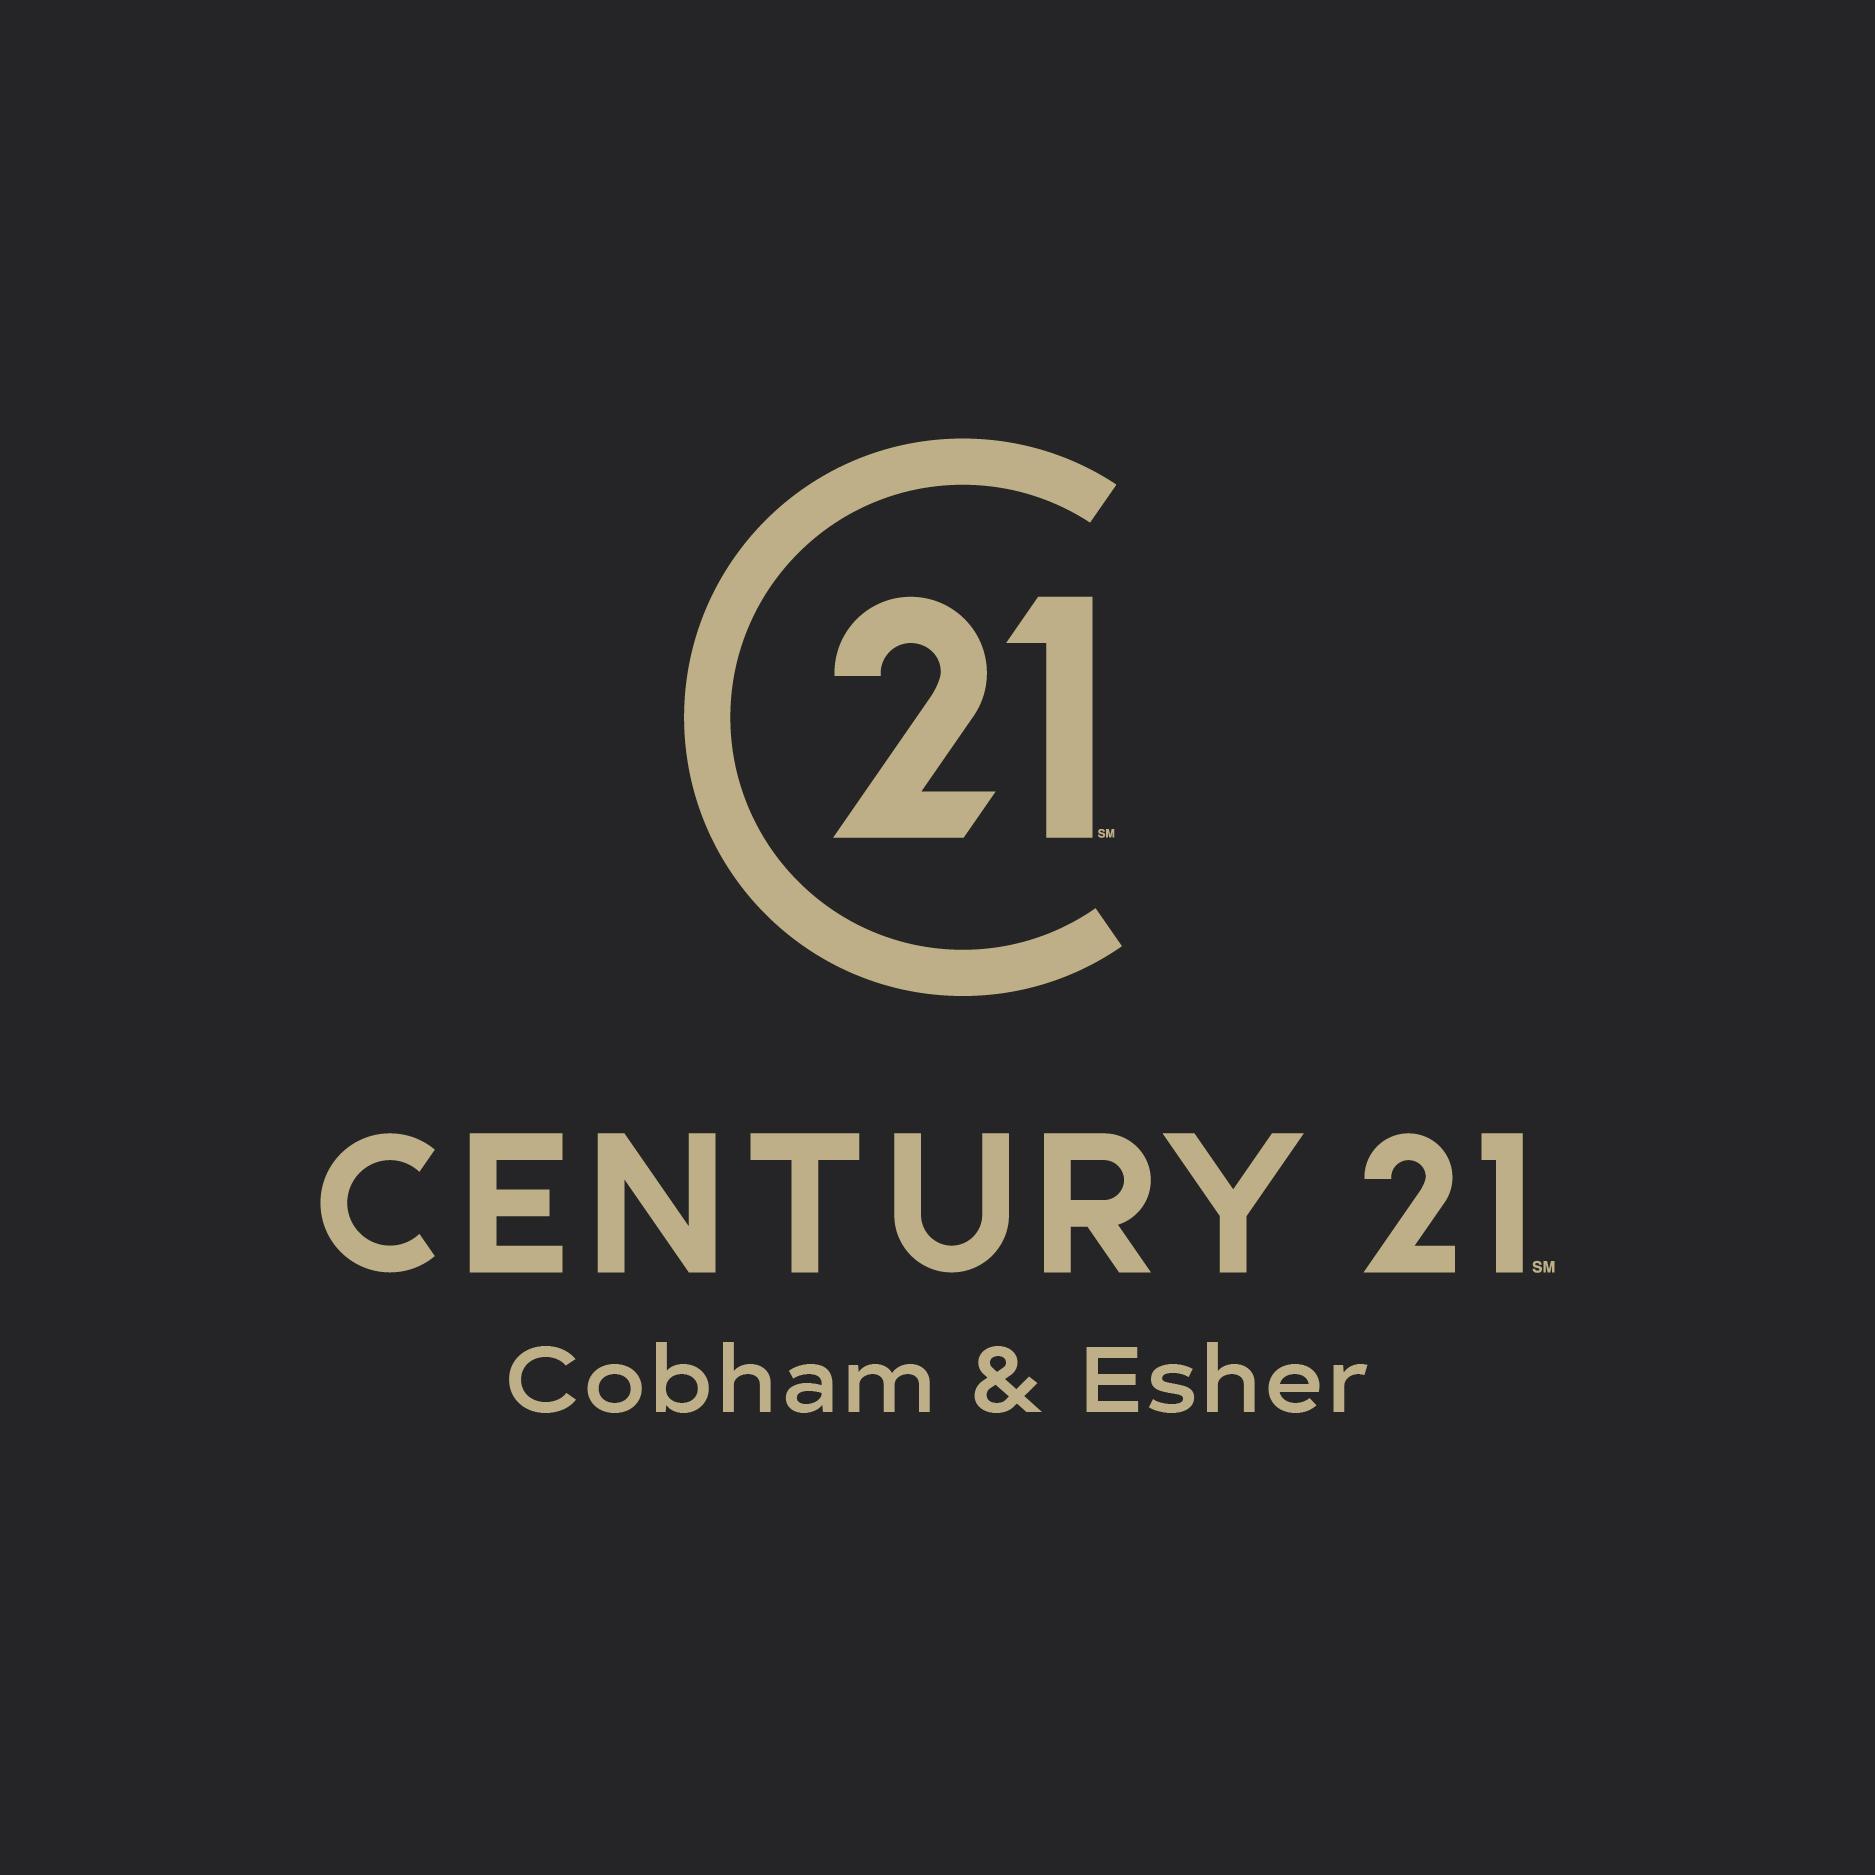 Century 21 - Cobham & Esher